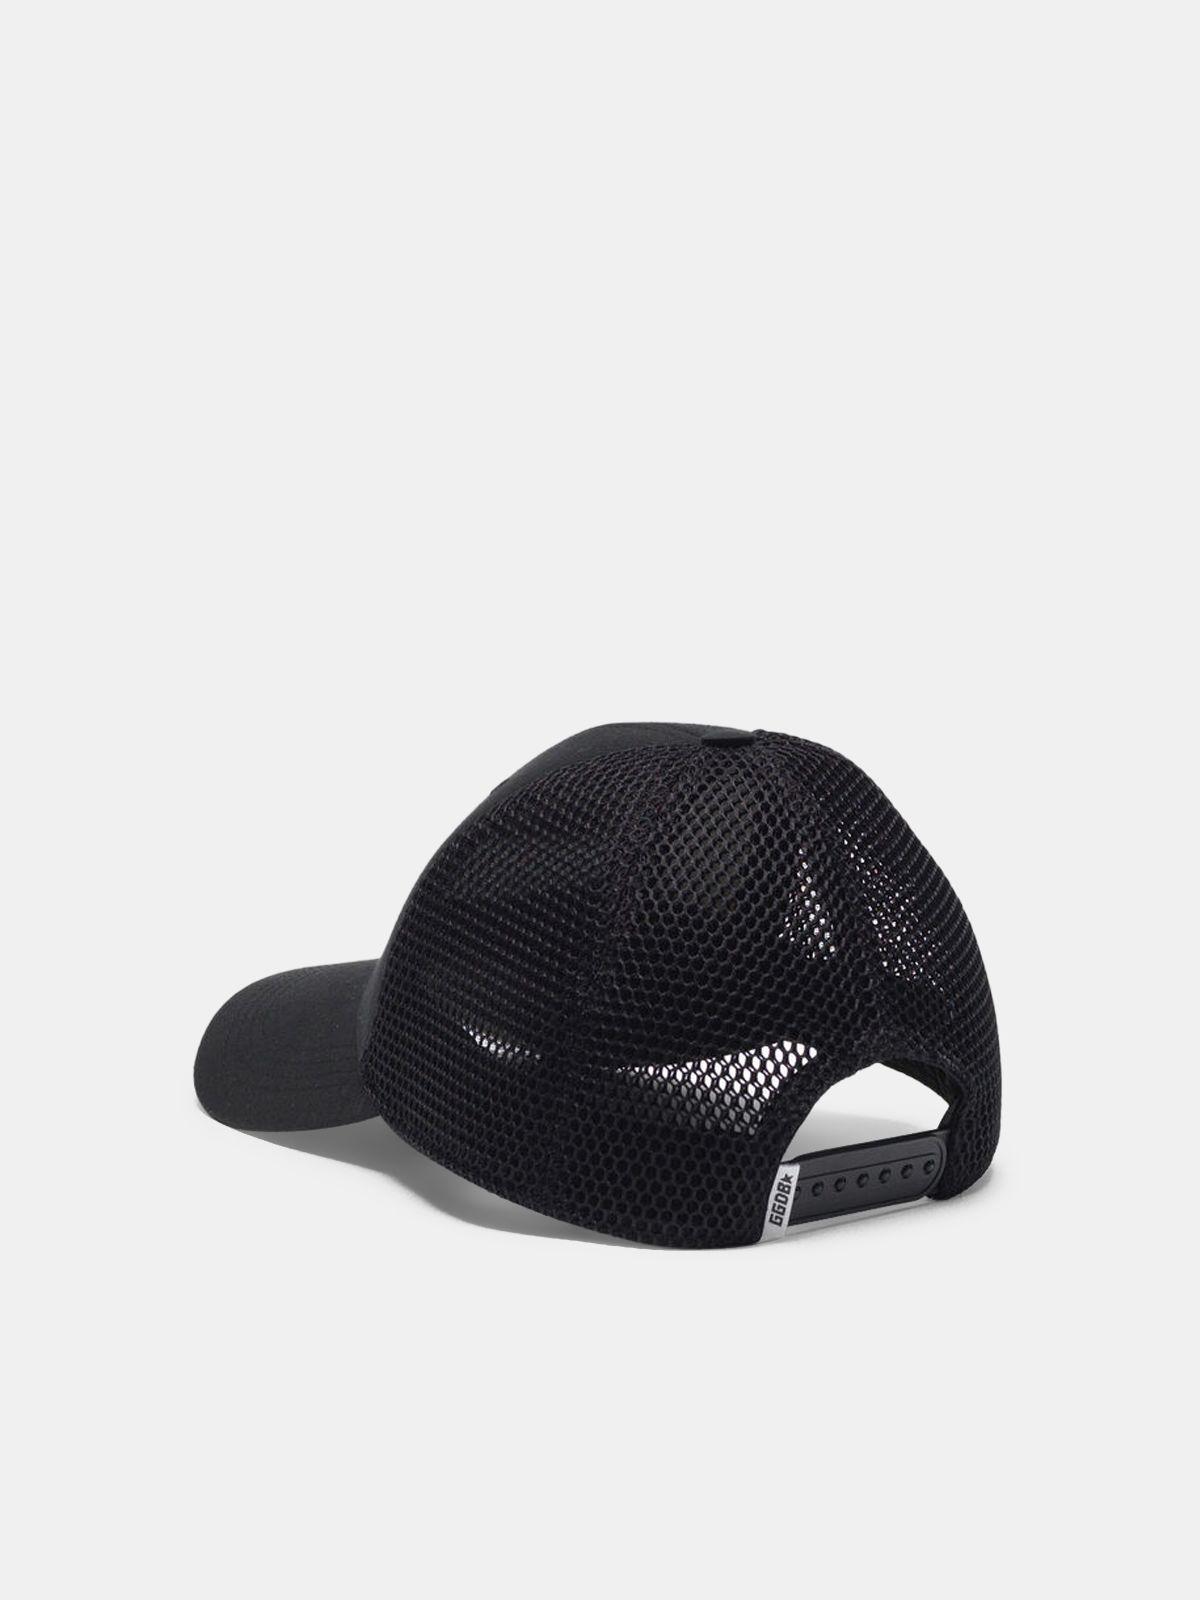 Golden Goose - Black Savannah baseball cap with embroidered logo in